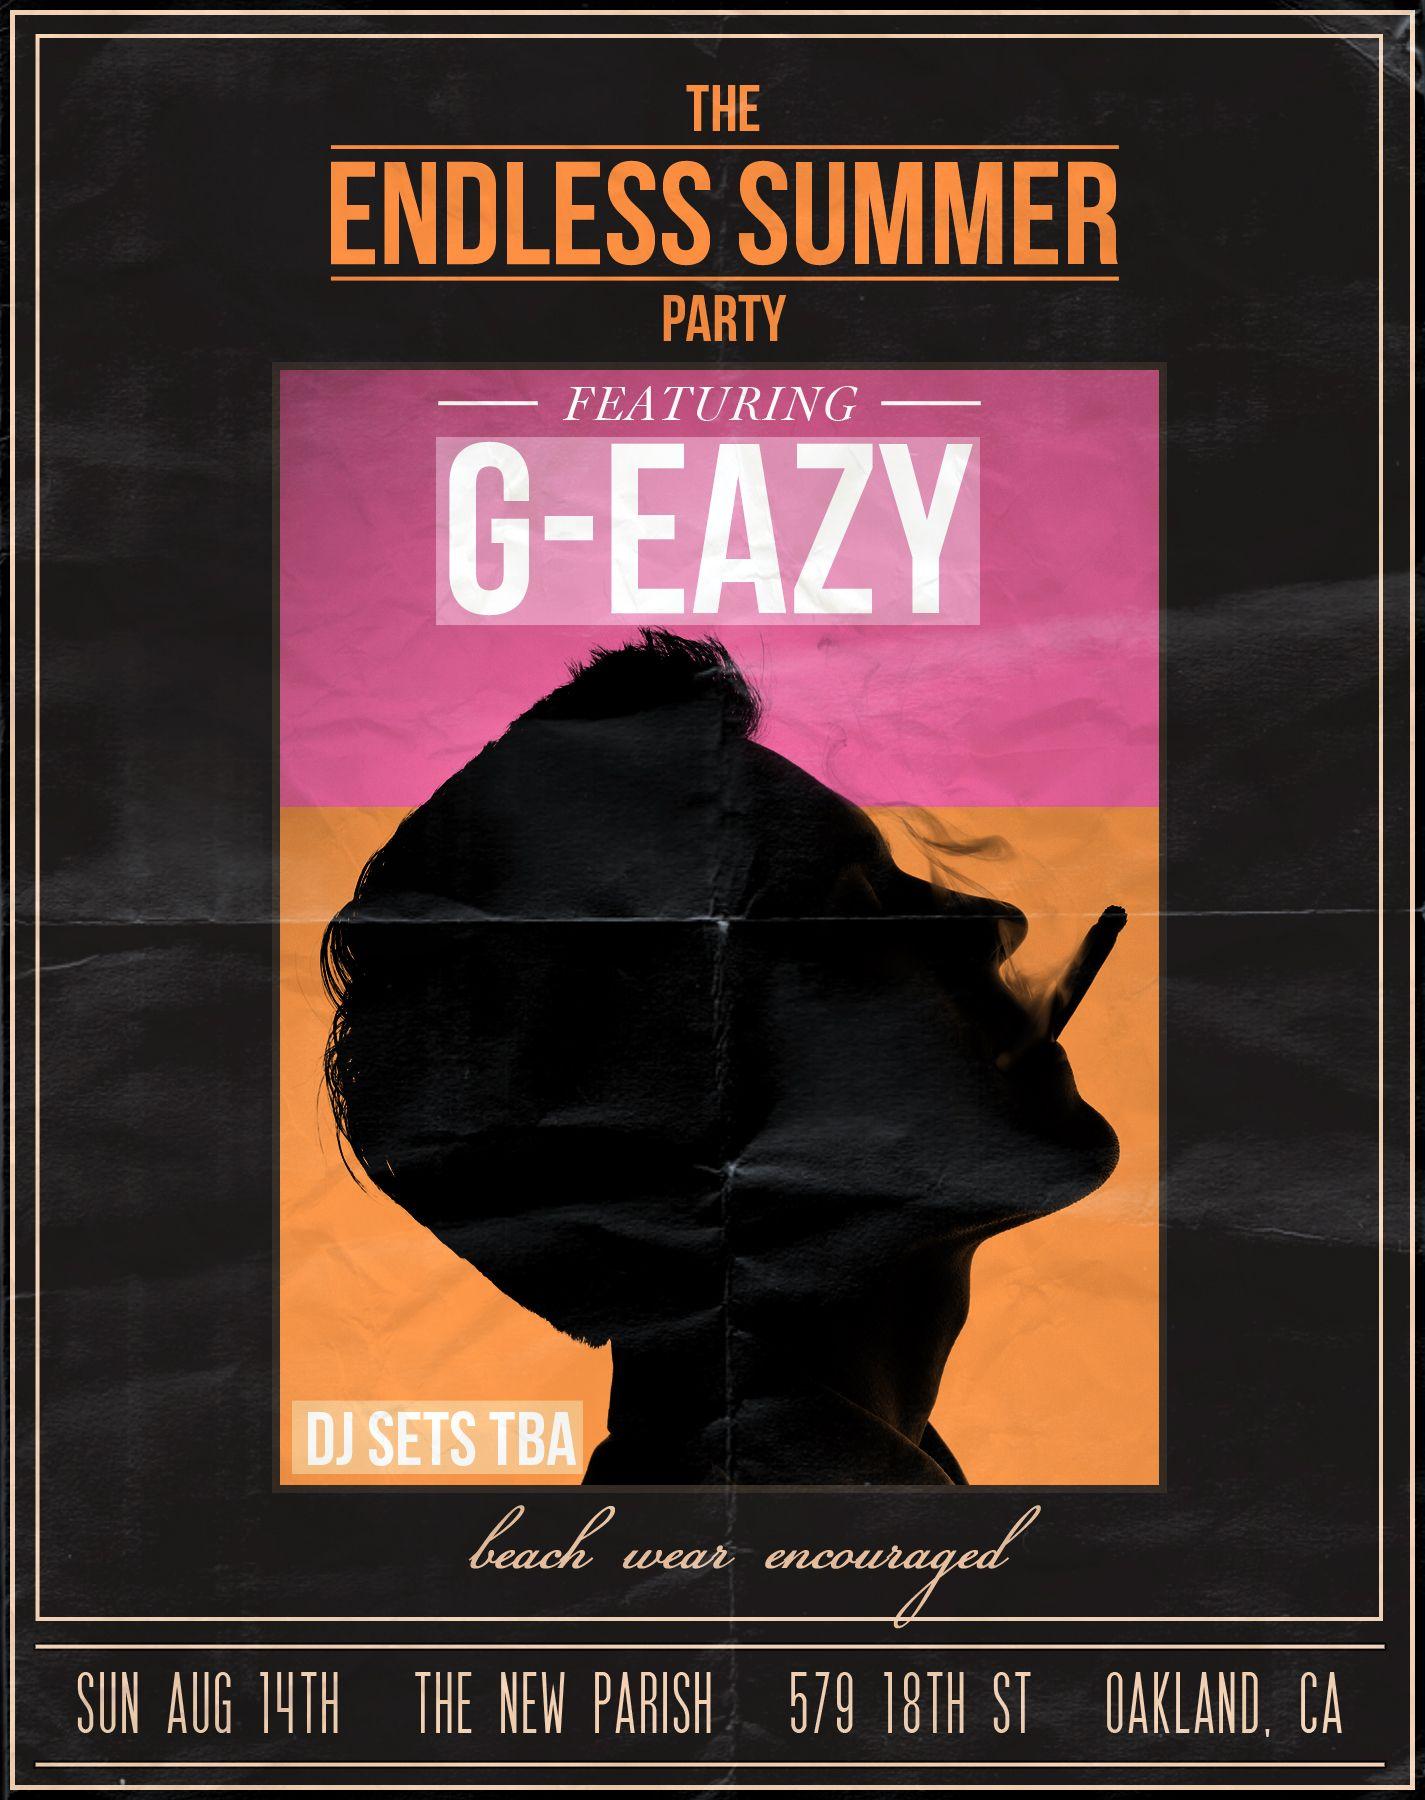 G Eazy Endless Summer Album And Poster Art G Eazy Music G